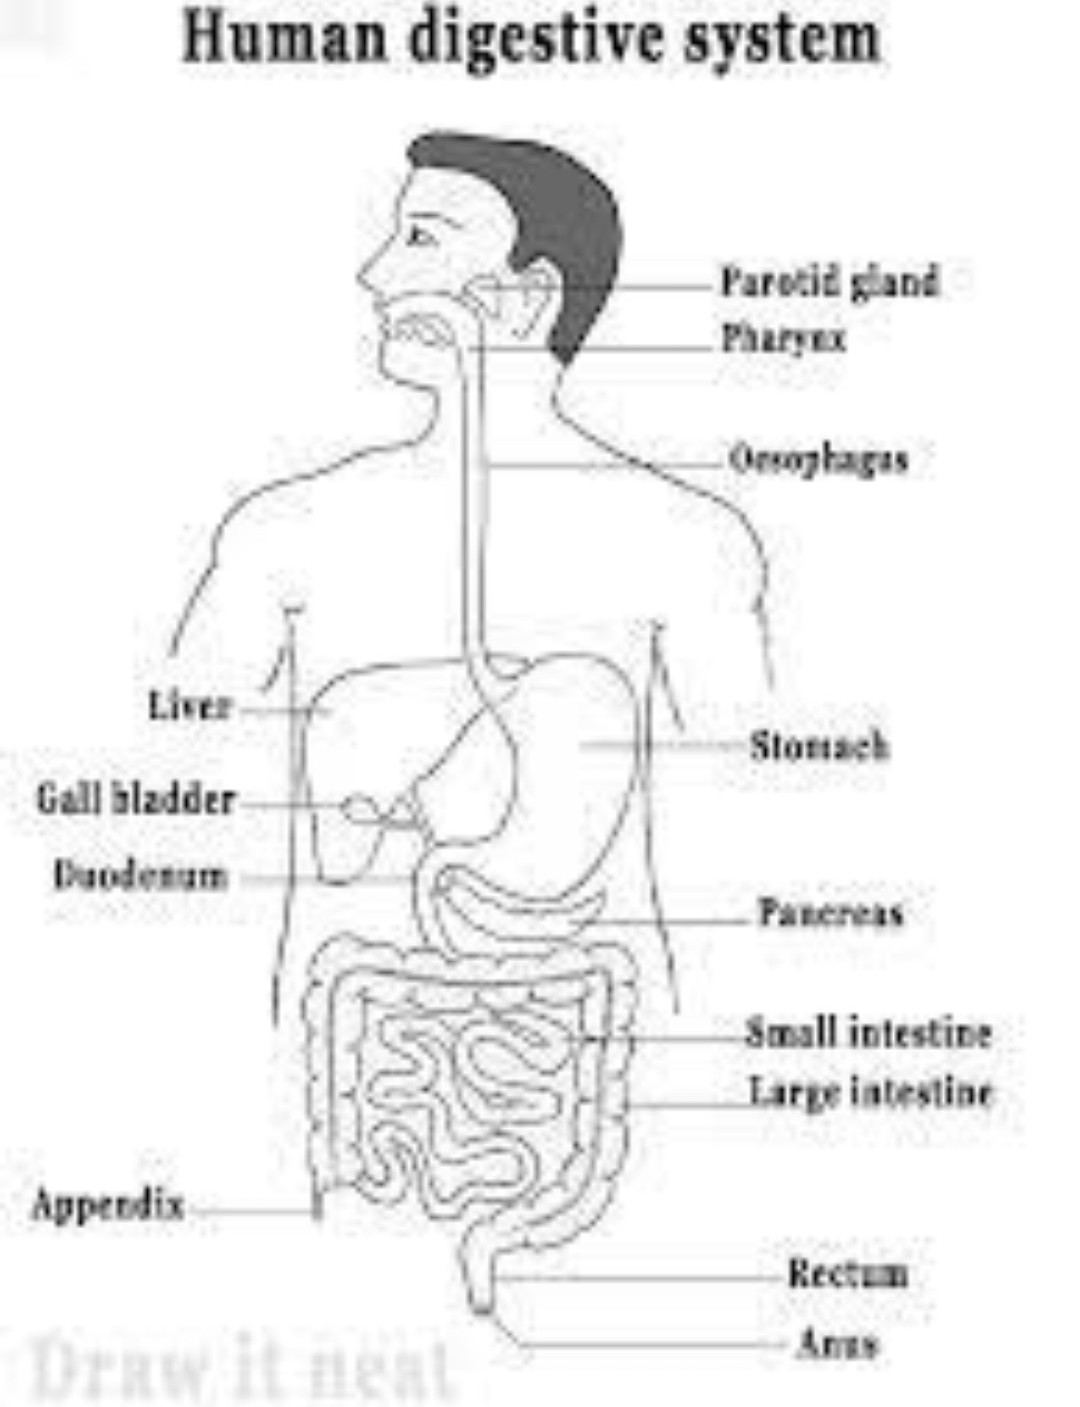 Digestive System Labeling Diagram